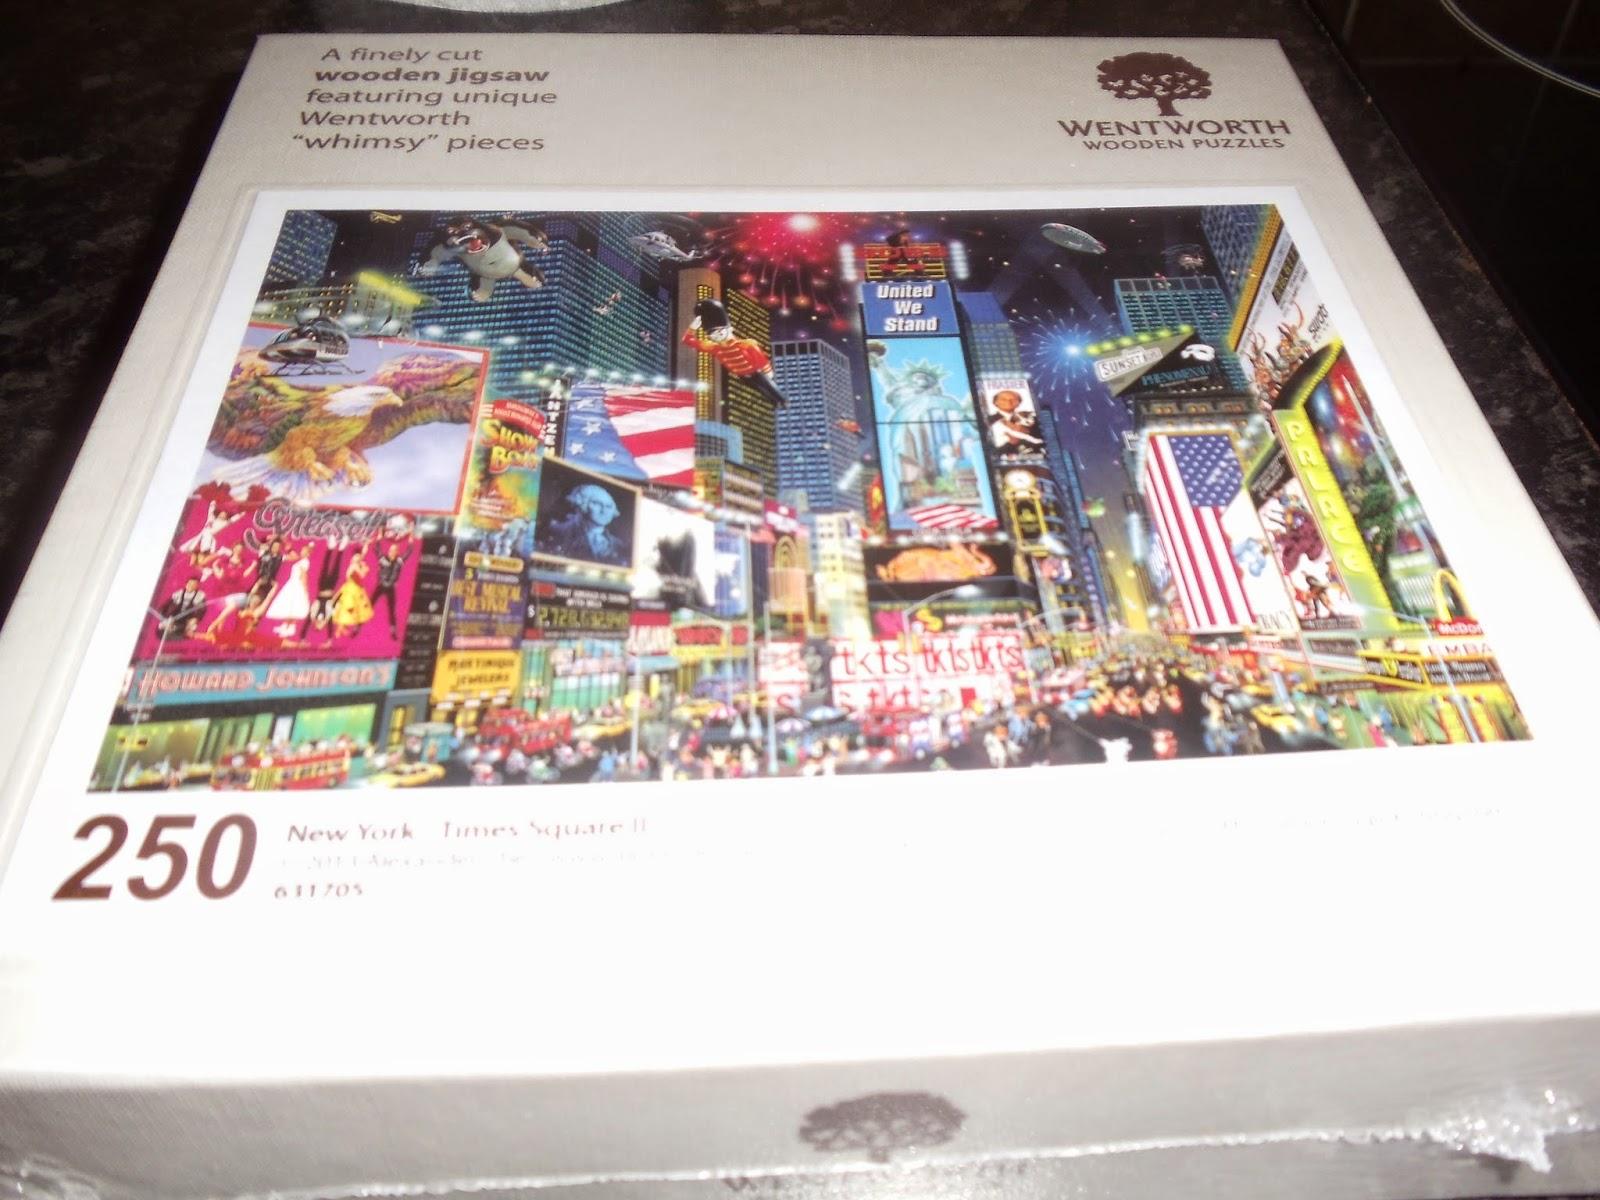 New York Times Square Ii Jigsaw Playdays And Runways